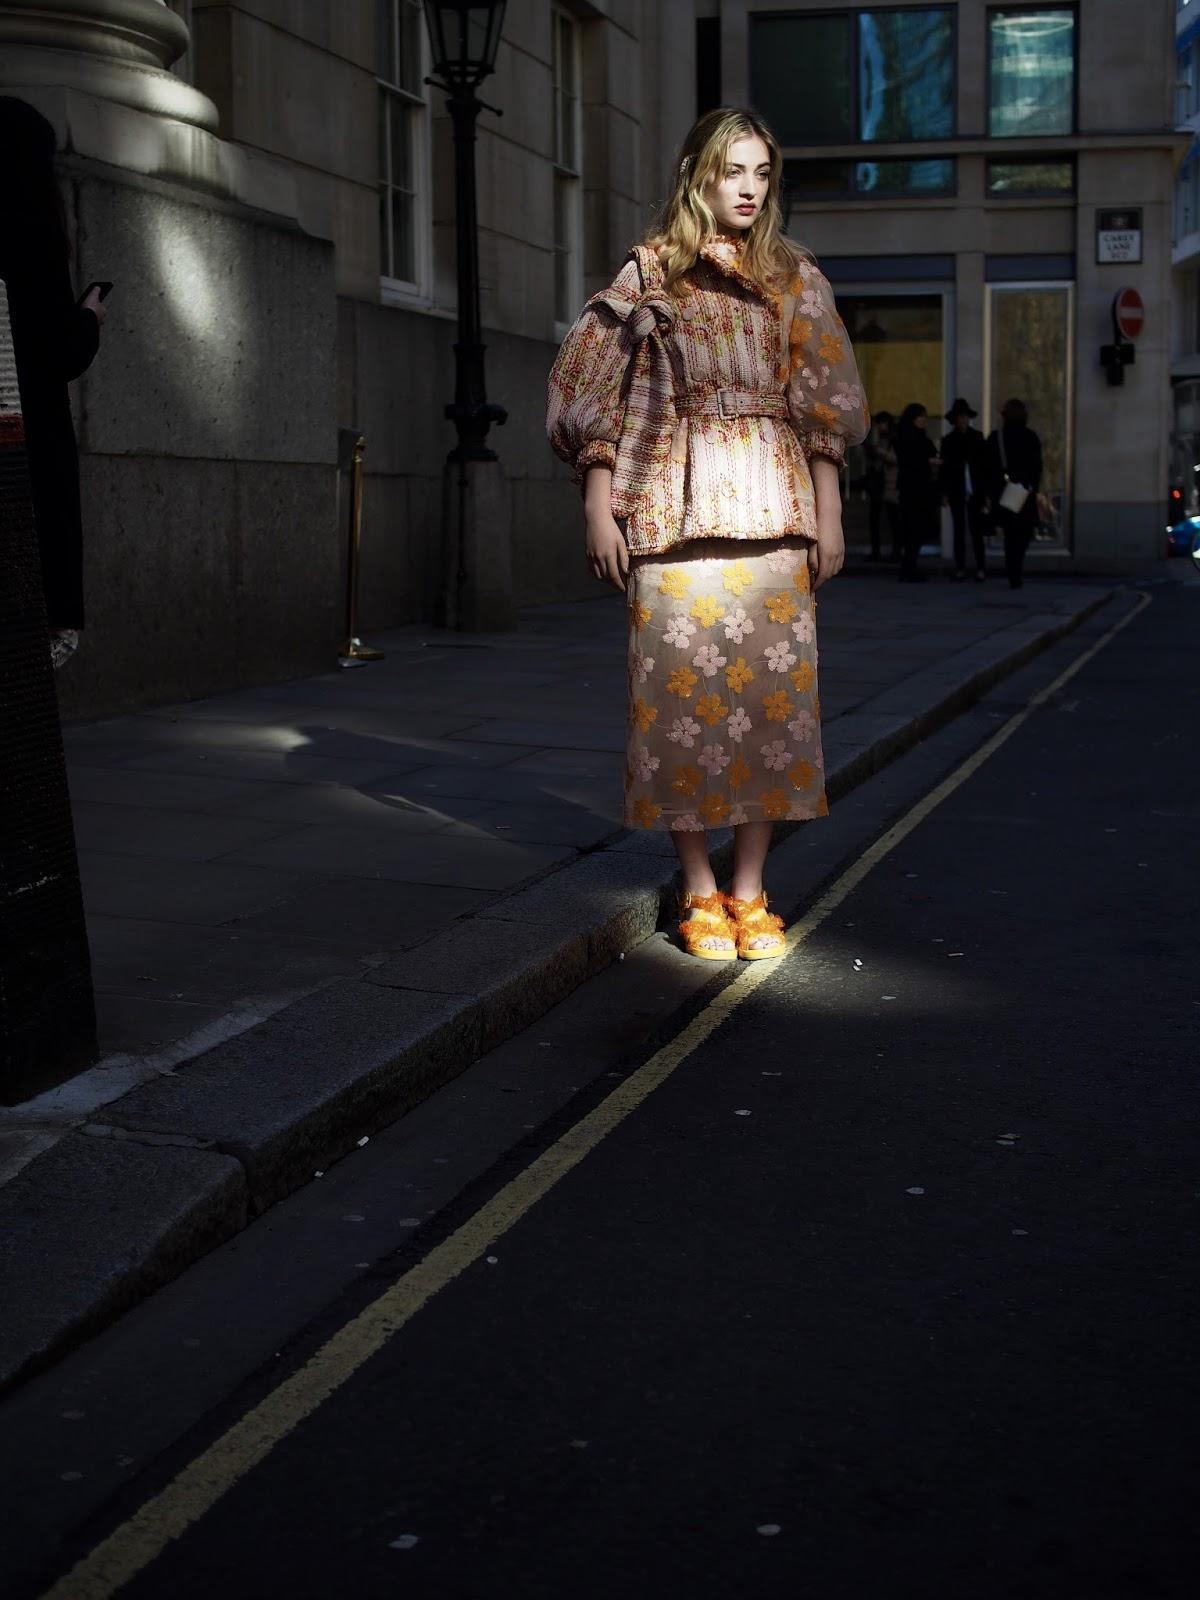 London fashion trends winter 2018 15